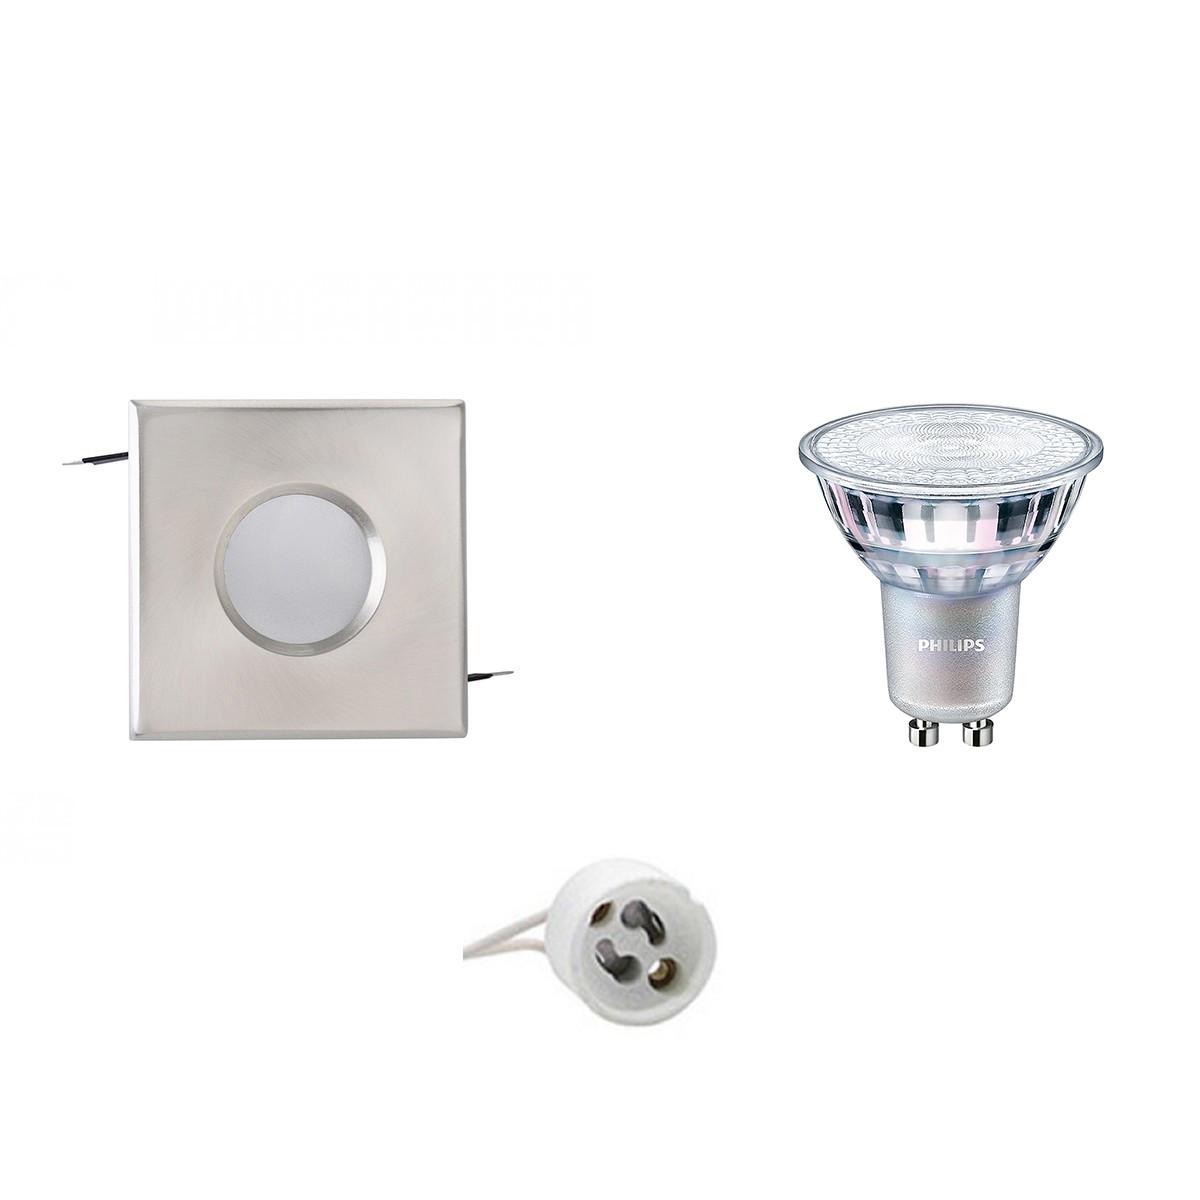 PHILIPS - LED Spot Set - MASTER 927 36D VLE - Aigi - GU10 Fitting - Waterdicht IP65 - DimTone Dimbaa